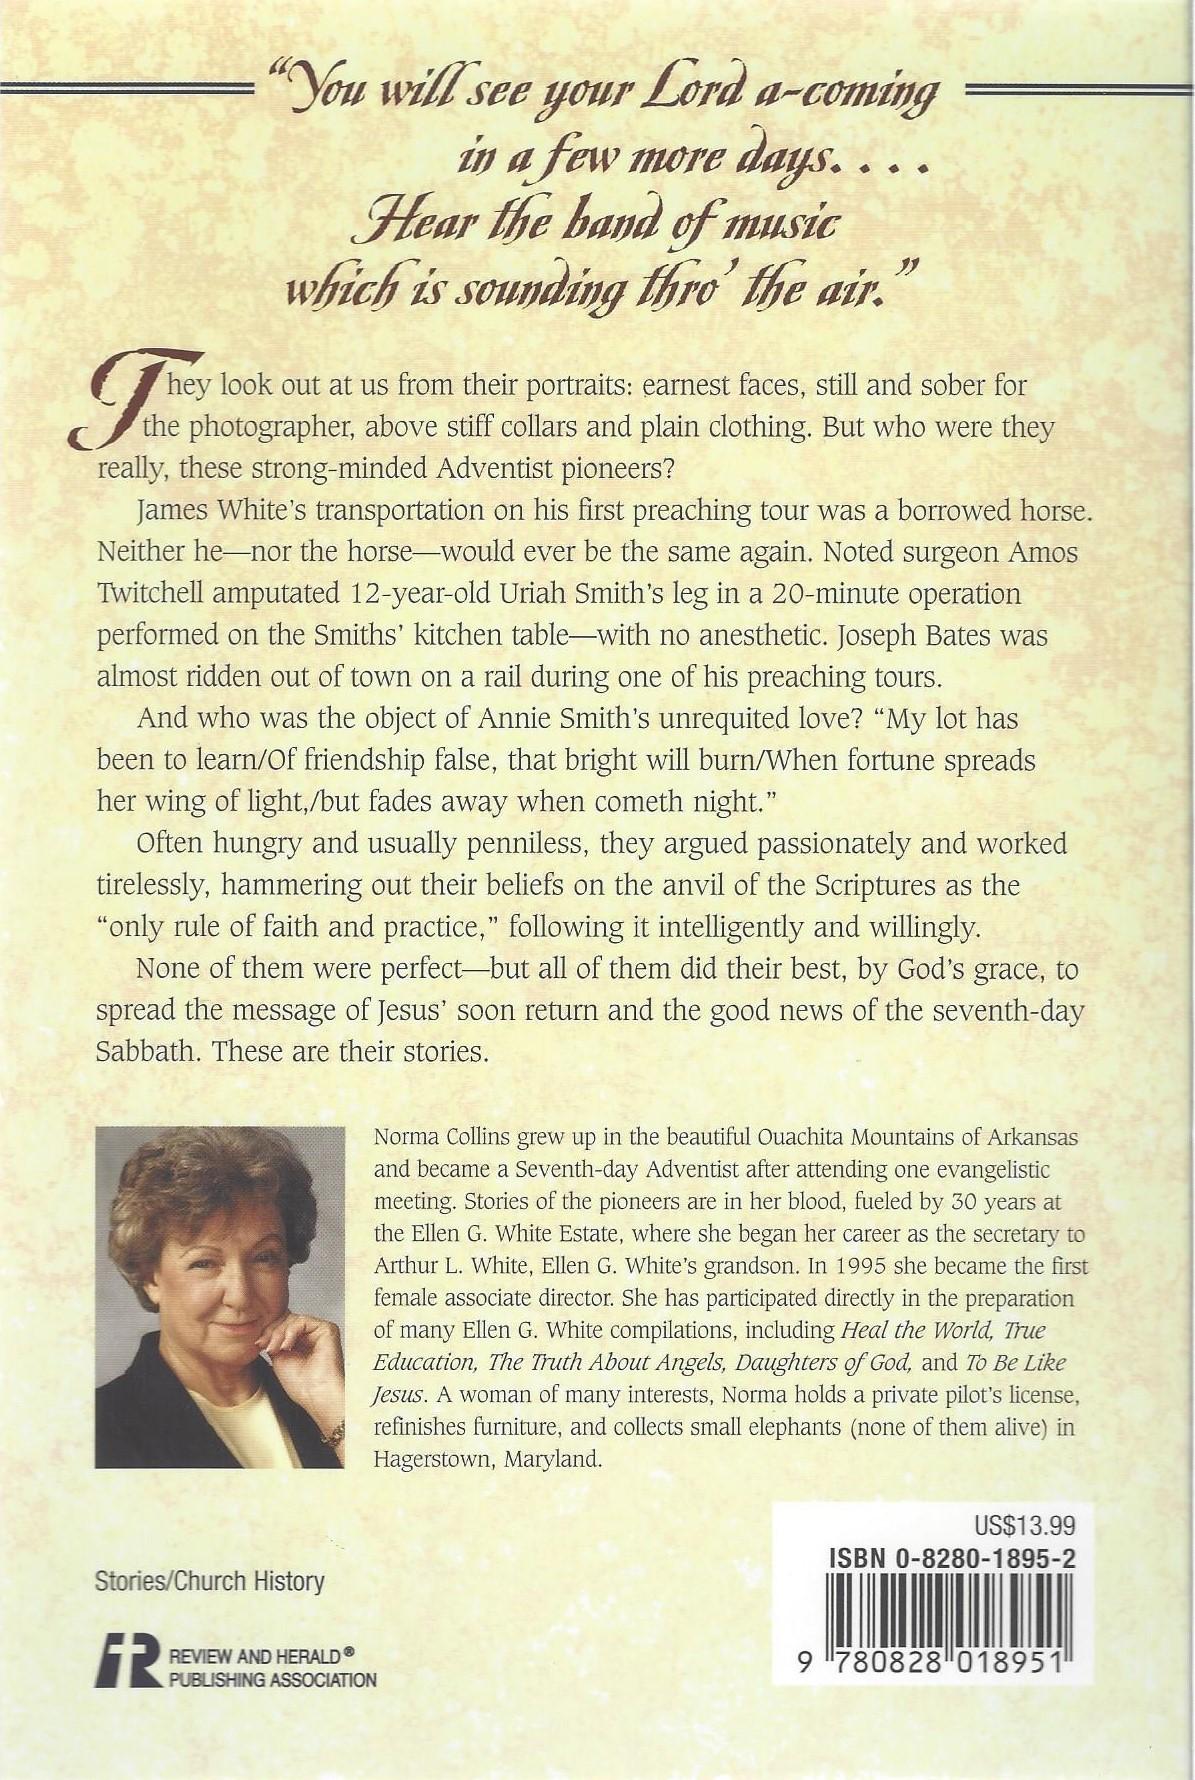 Heartwarming Stories of Adventist Pioneers, Book 1